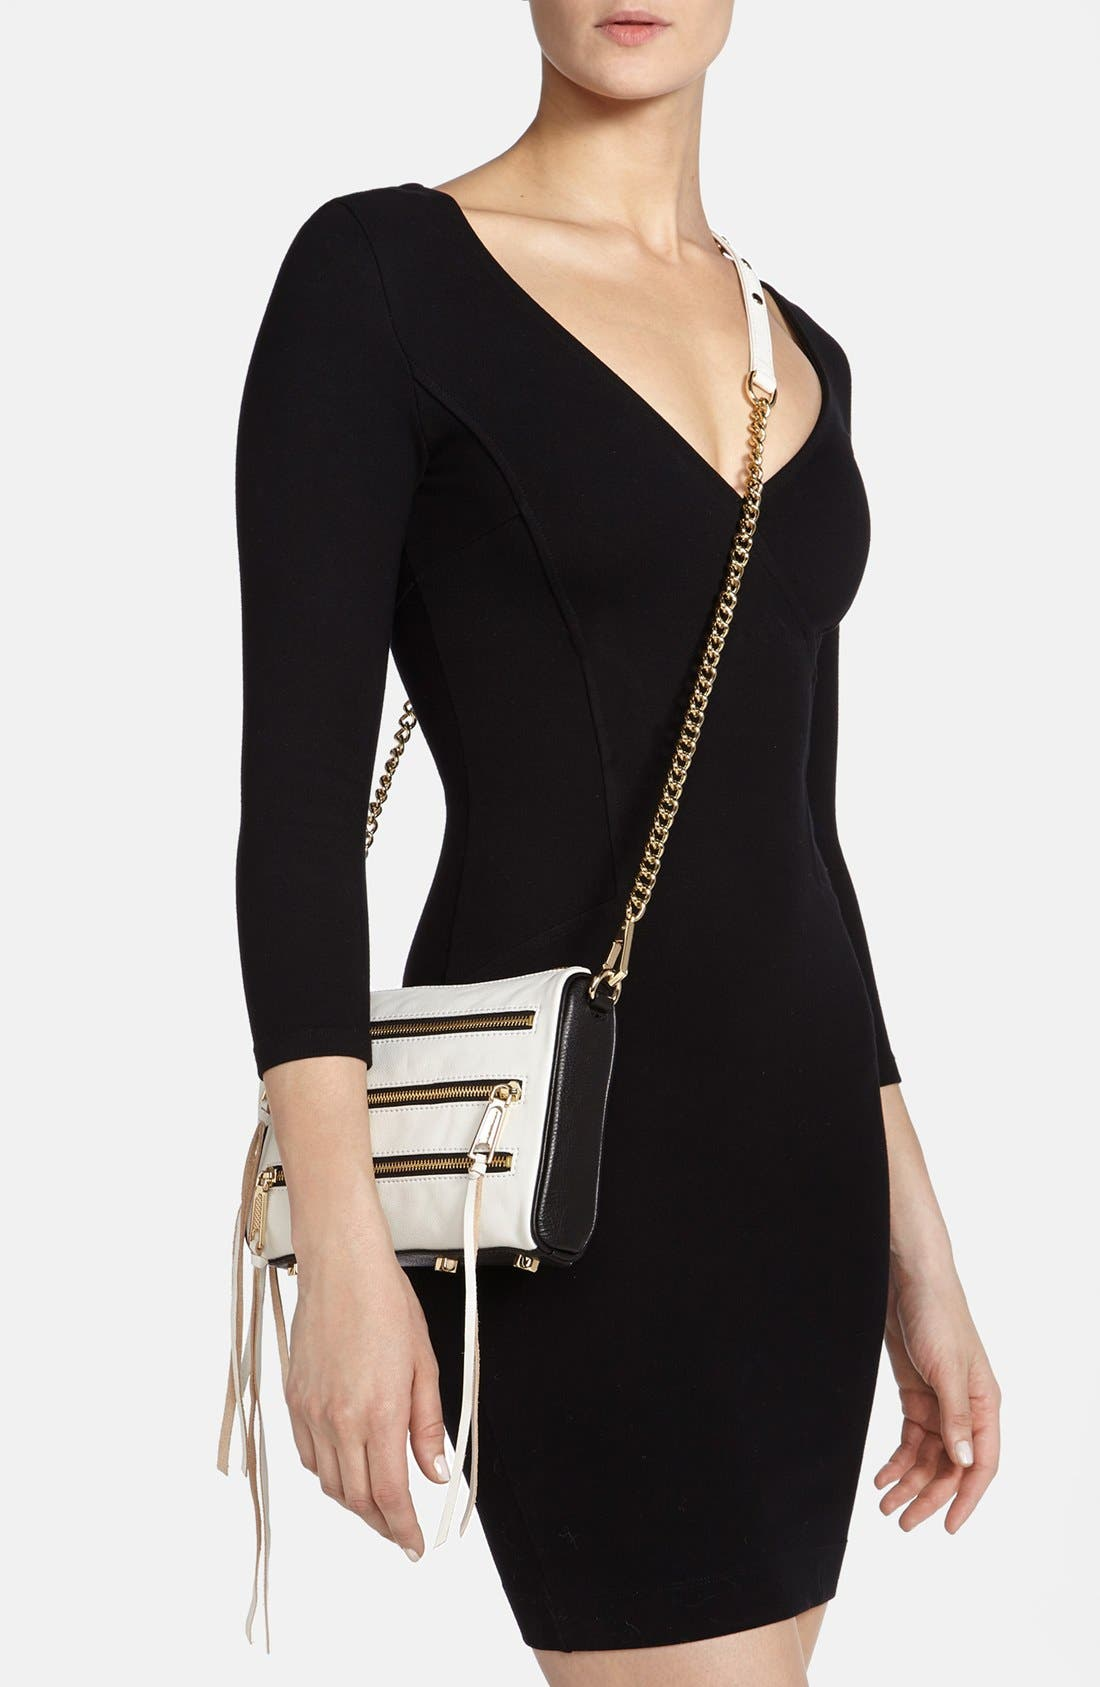 Alternate Image 2  - Rebecca Minkoff '5 Zip - Mini' Two-Tone Leather Crossbody Bag